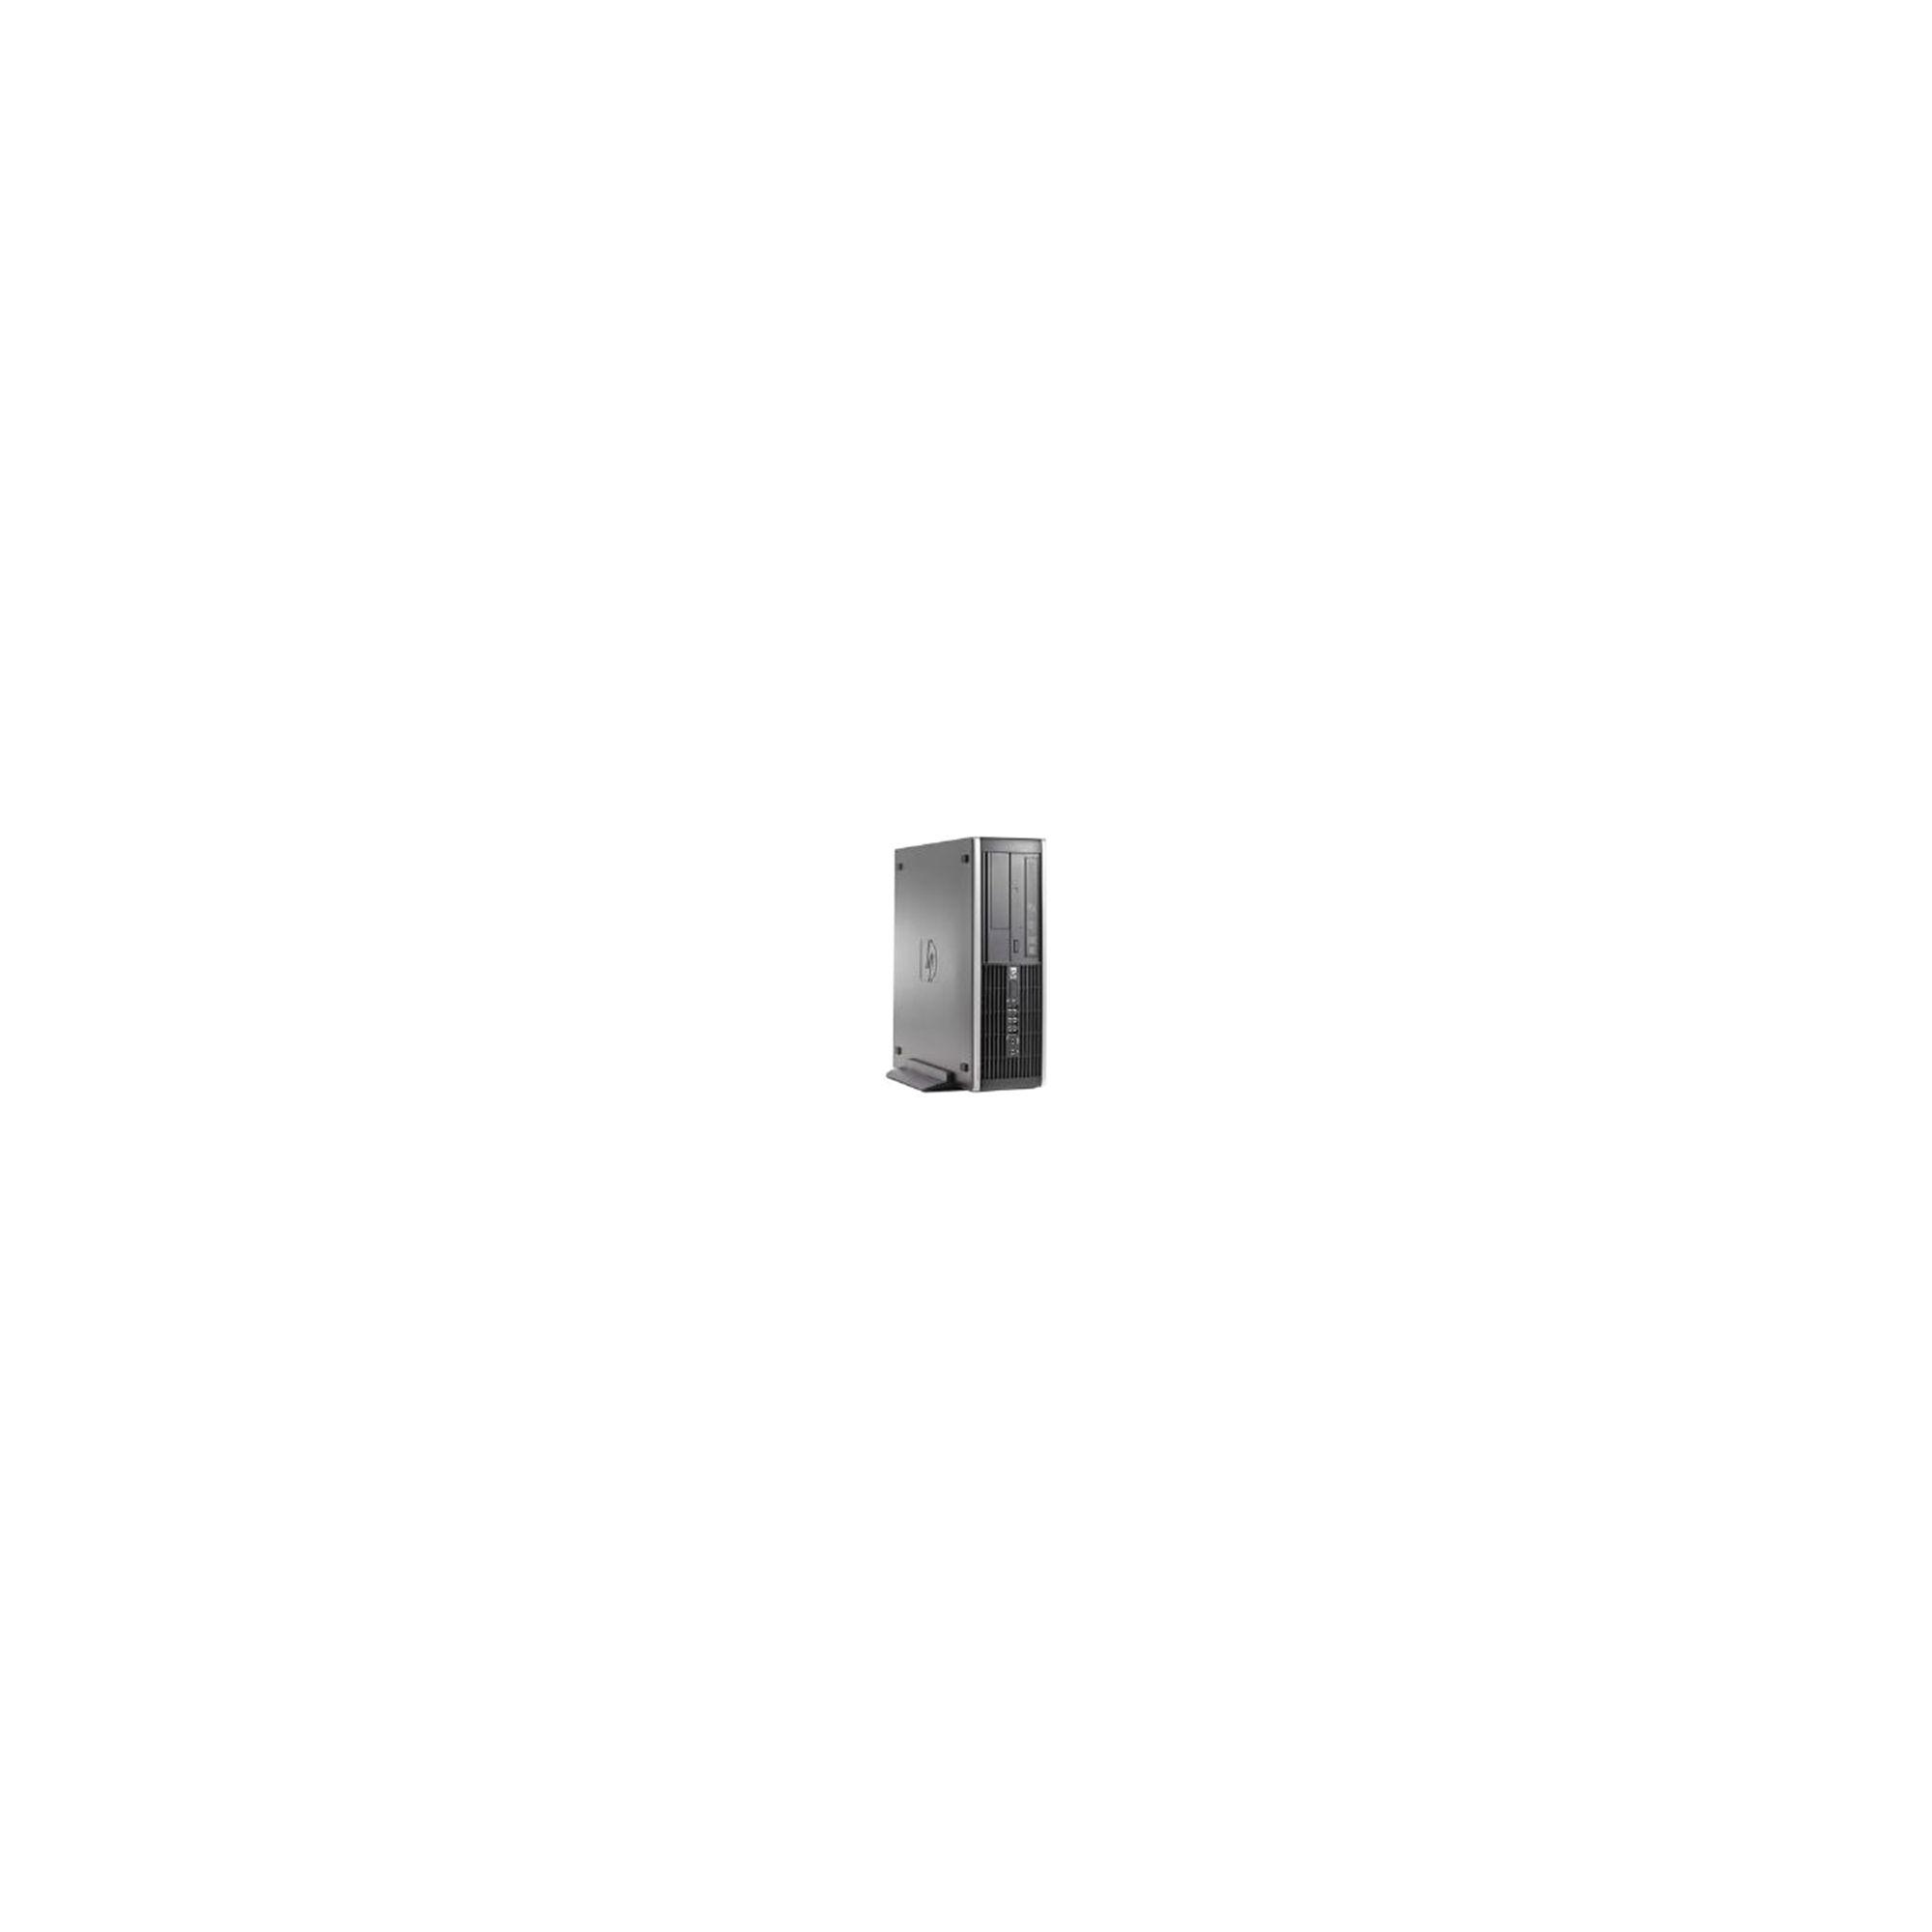 Compaq 8300 Elite SFF PC Core i5 (3470) 3.2GHz 4GB 500GB DVD Writer SM LAN Windows 7 Pro 64-bit (Intel HD Graphics 2500) Energy Star